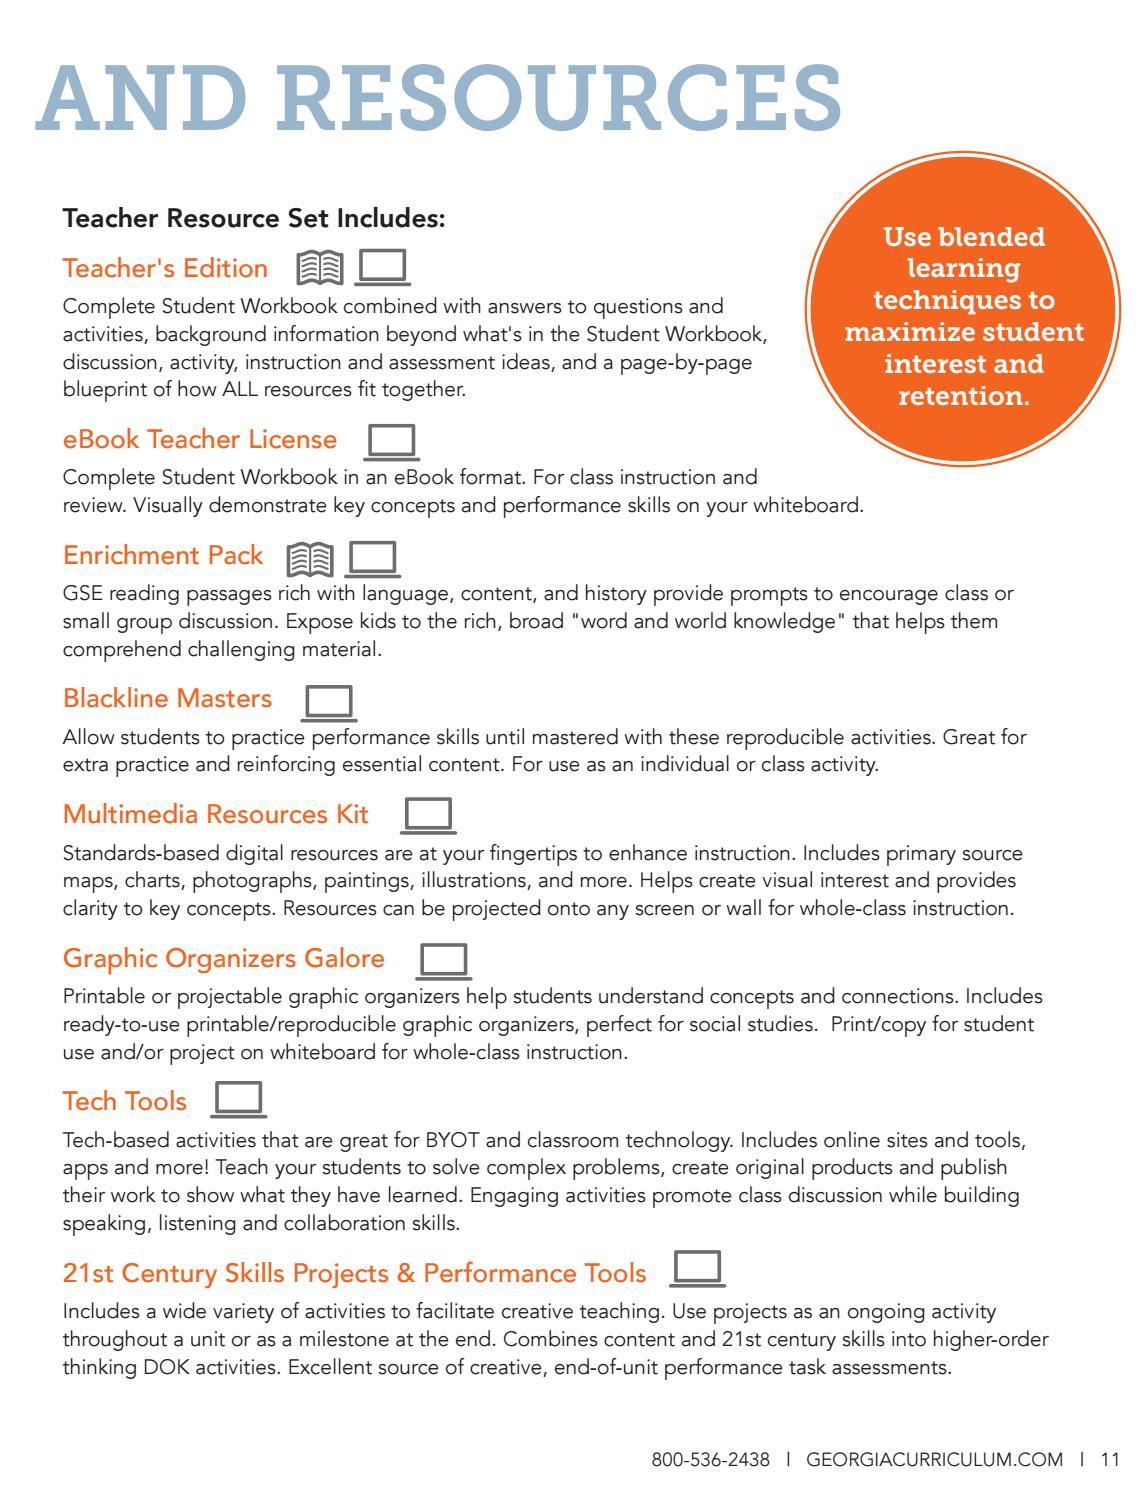 2017-2018 Georgia Experience Curriculum Catalog by Gallopade